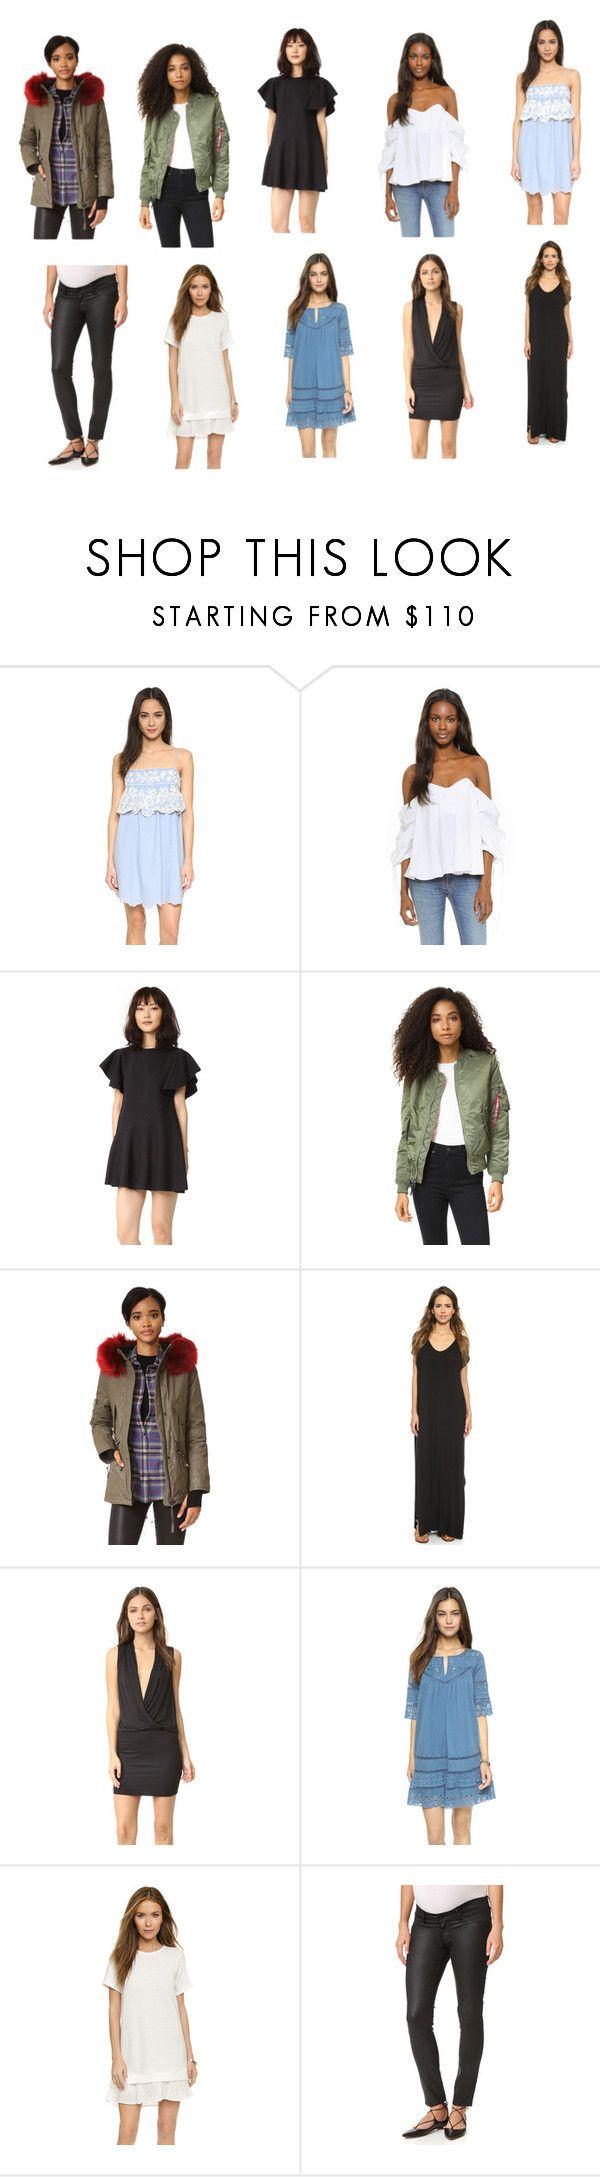 """casual wear dress collection"" by monica022 ❤ liked on Polyvore featuring Love Sam, Caroline Constas, Goen.J, Alpha Industries, SAM., Clayton, Lanston, Clu, DL1961 Premium Denim and vintage"